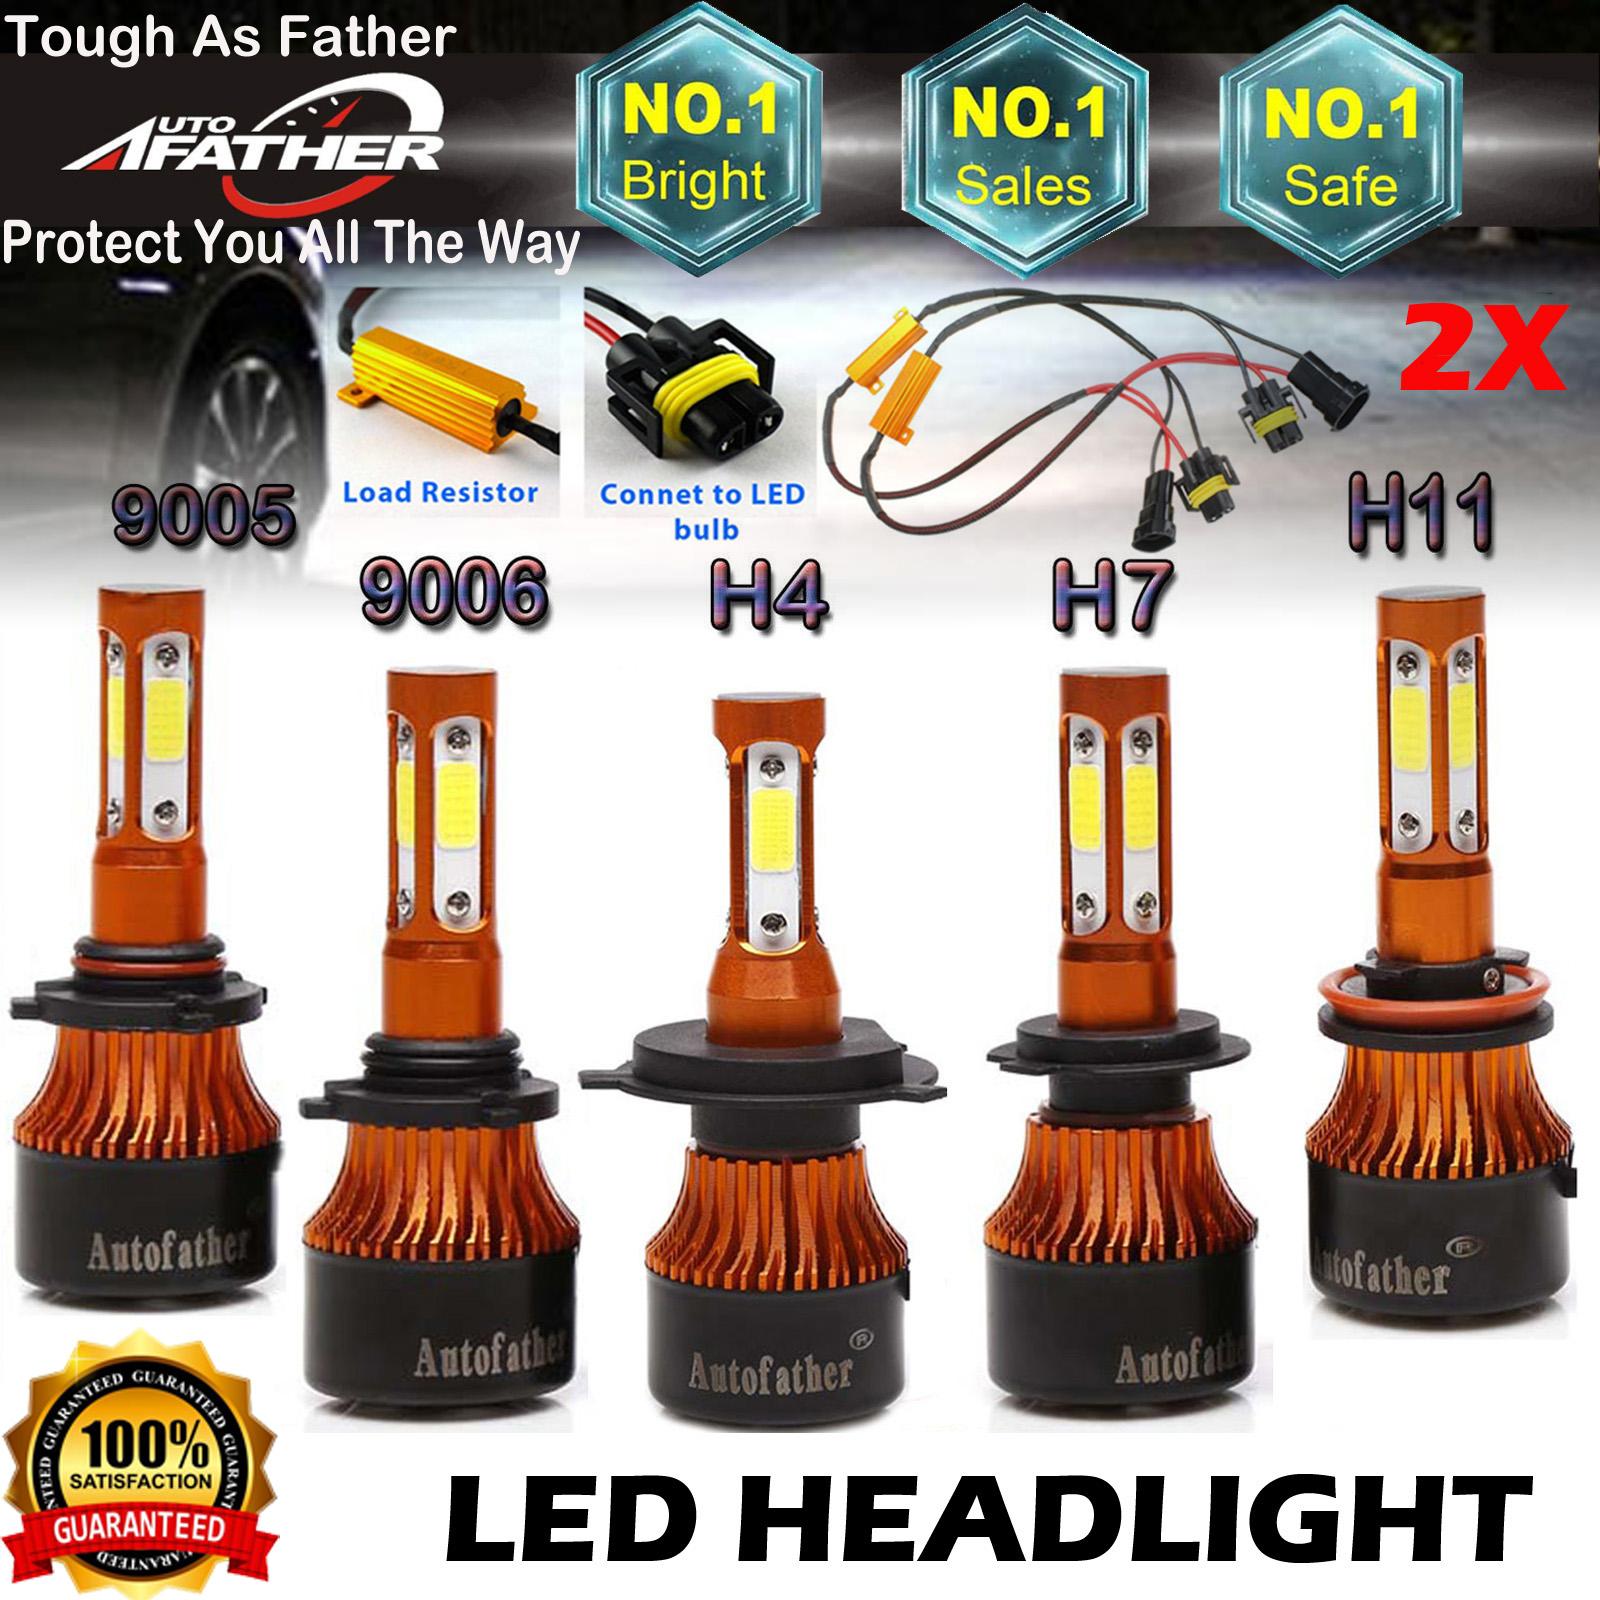 PAIR PHILIPS LED Headlight H11 H8 H9 320W 32000LM Kit Hi//Lo Beam Bulb HID 6500K